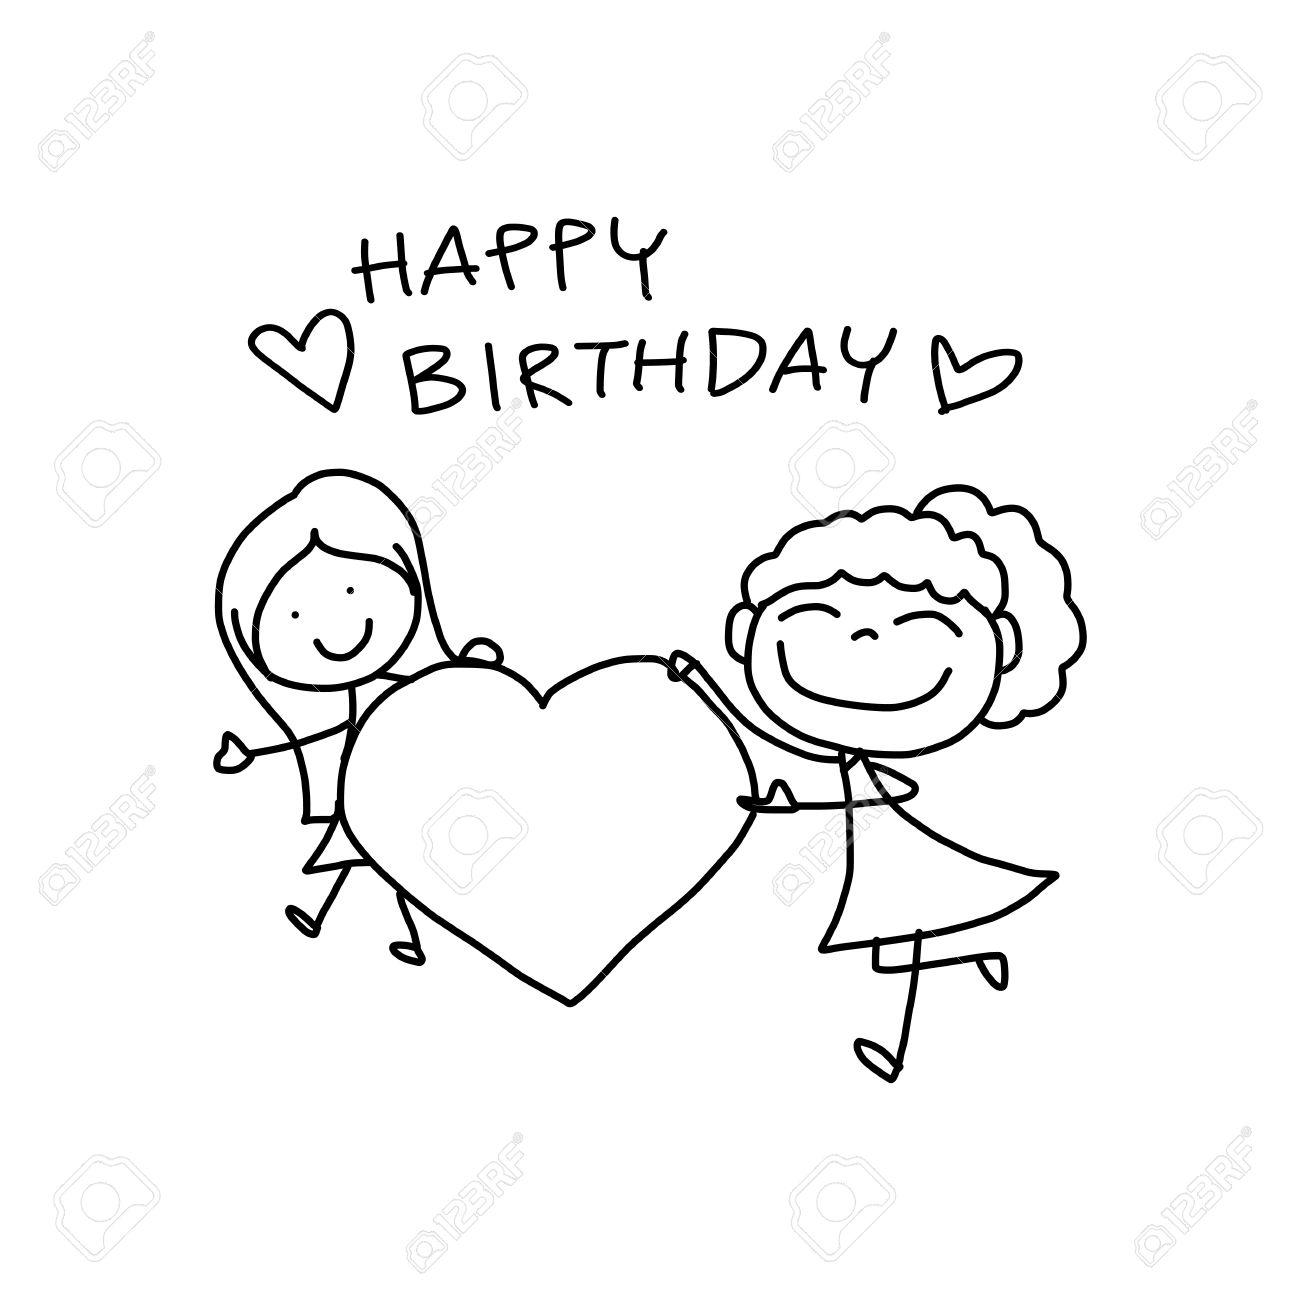 1300x1300 Hand Drawing Cartoon Happy Birthday Royalty Free Cliparts, Vectors